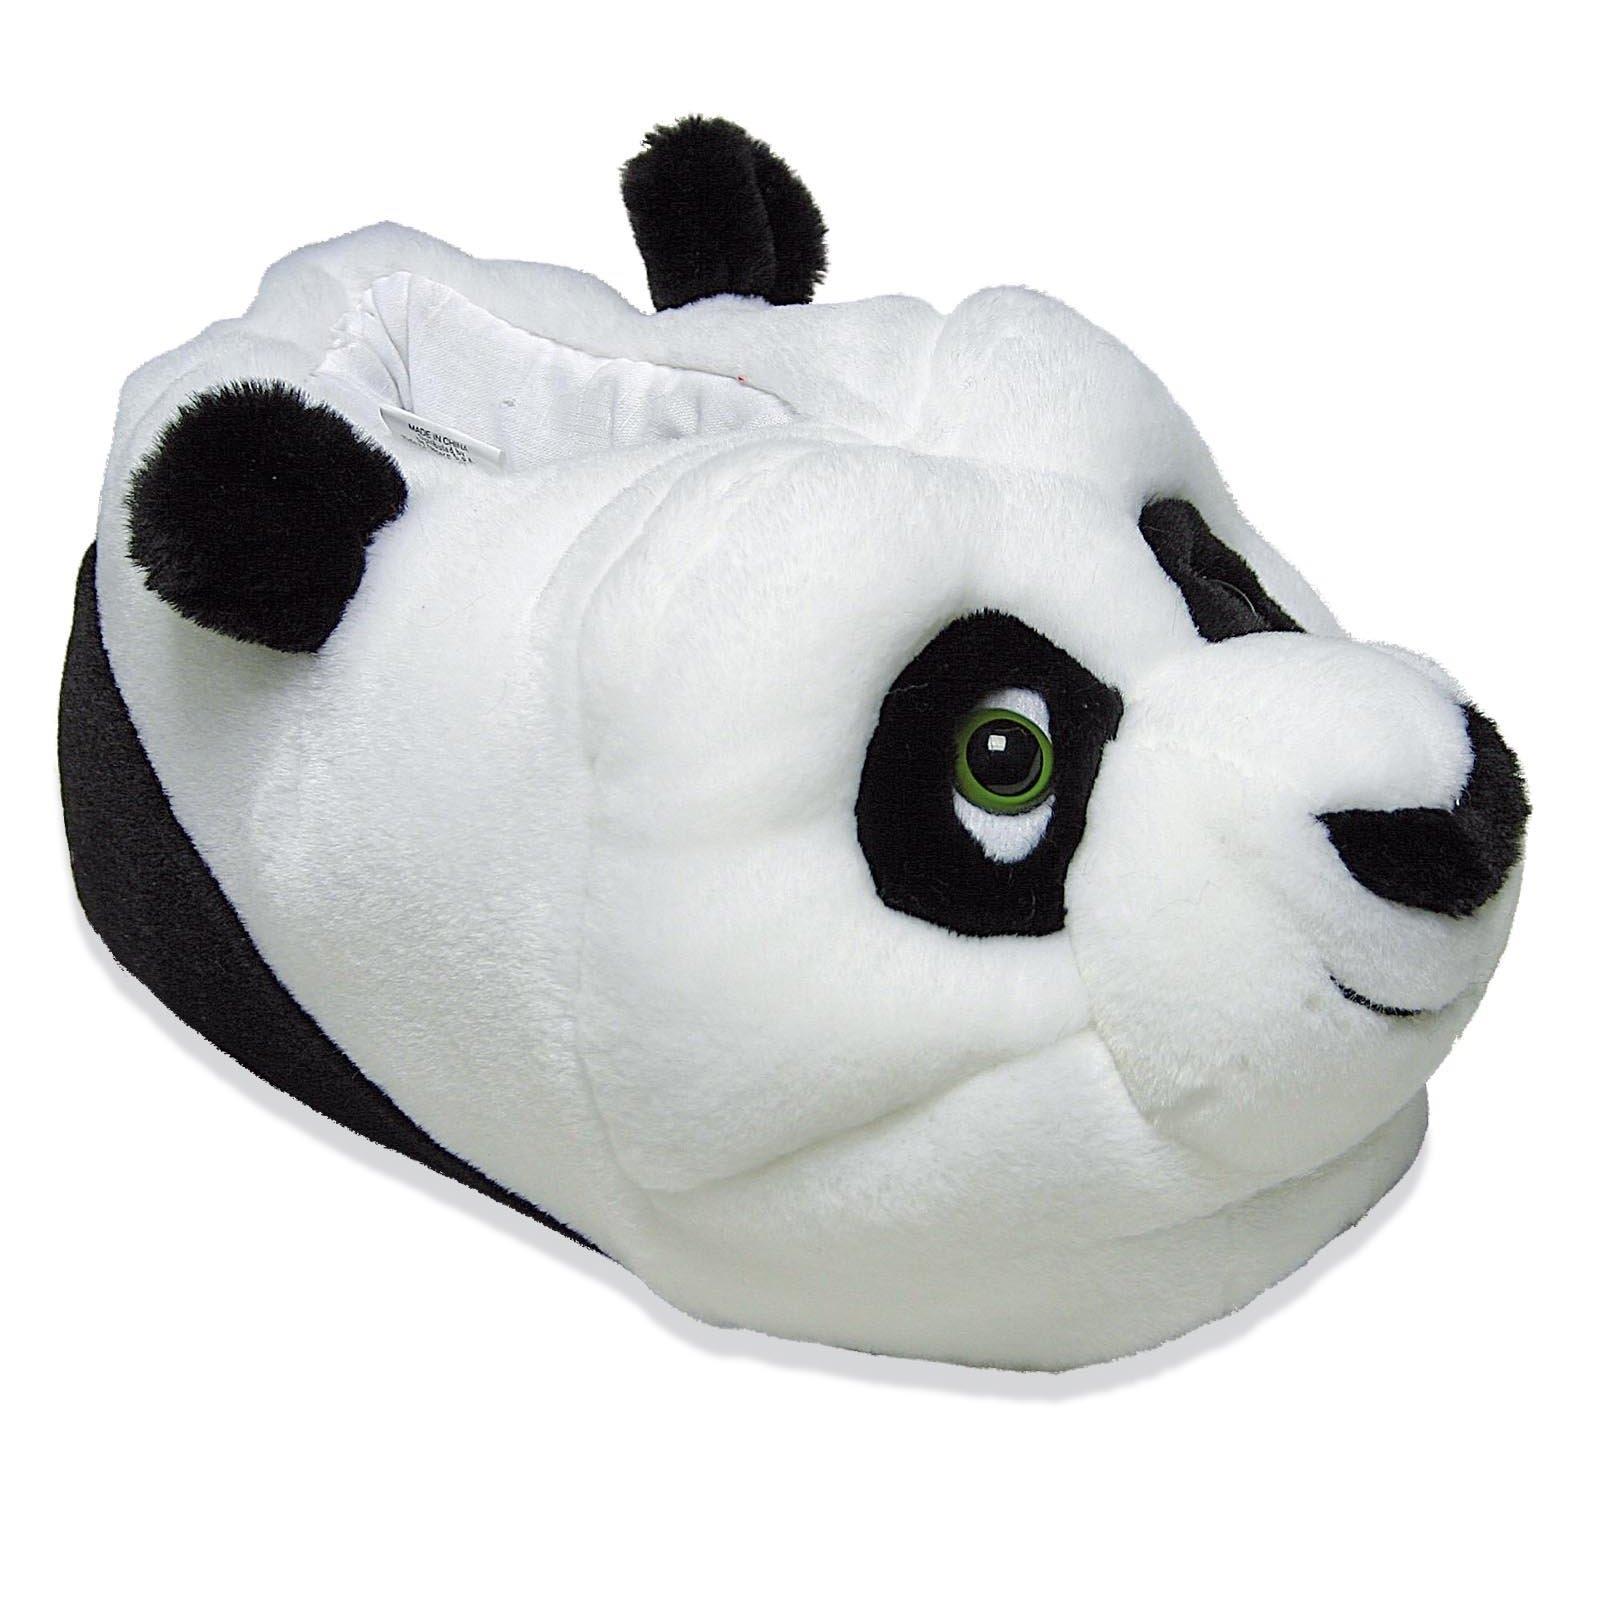 DISNEY KUNG FU PANDA Po Tier Hausschuhe Pantoffel Schlappen Kinder Weiß 29-35